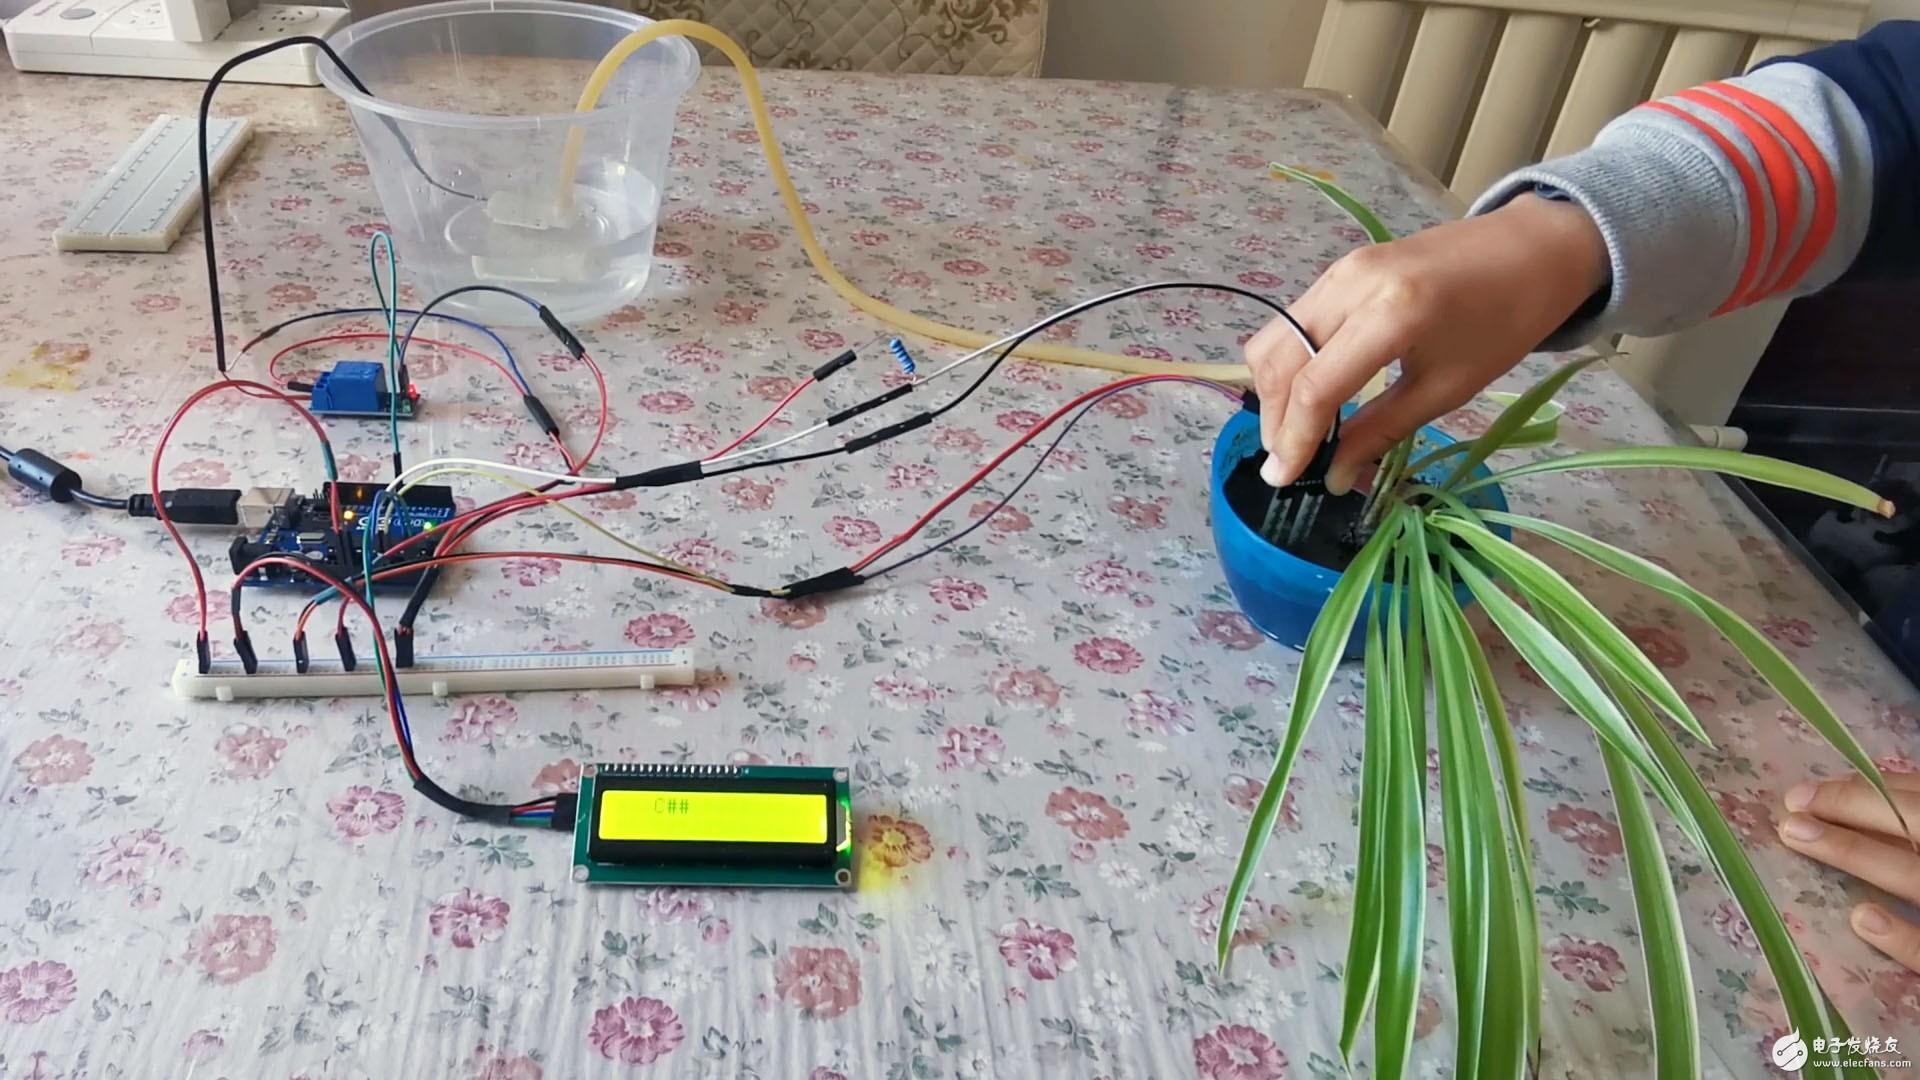 LLAKG:Arduino 自动浇花系统(第3集:C语言程序升级与功能优化)